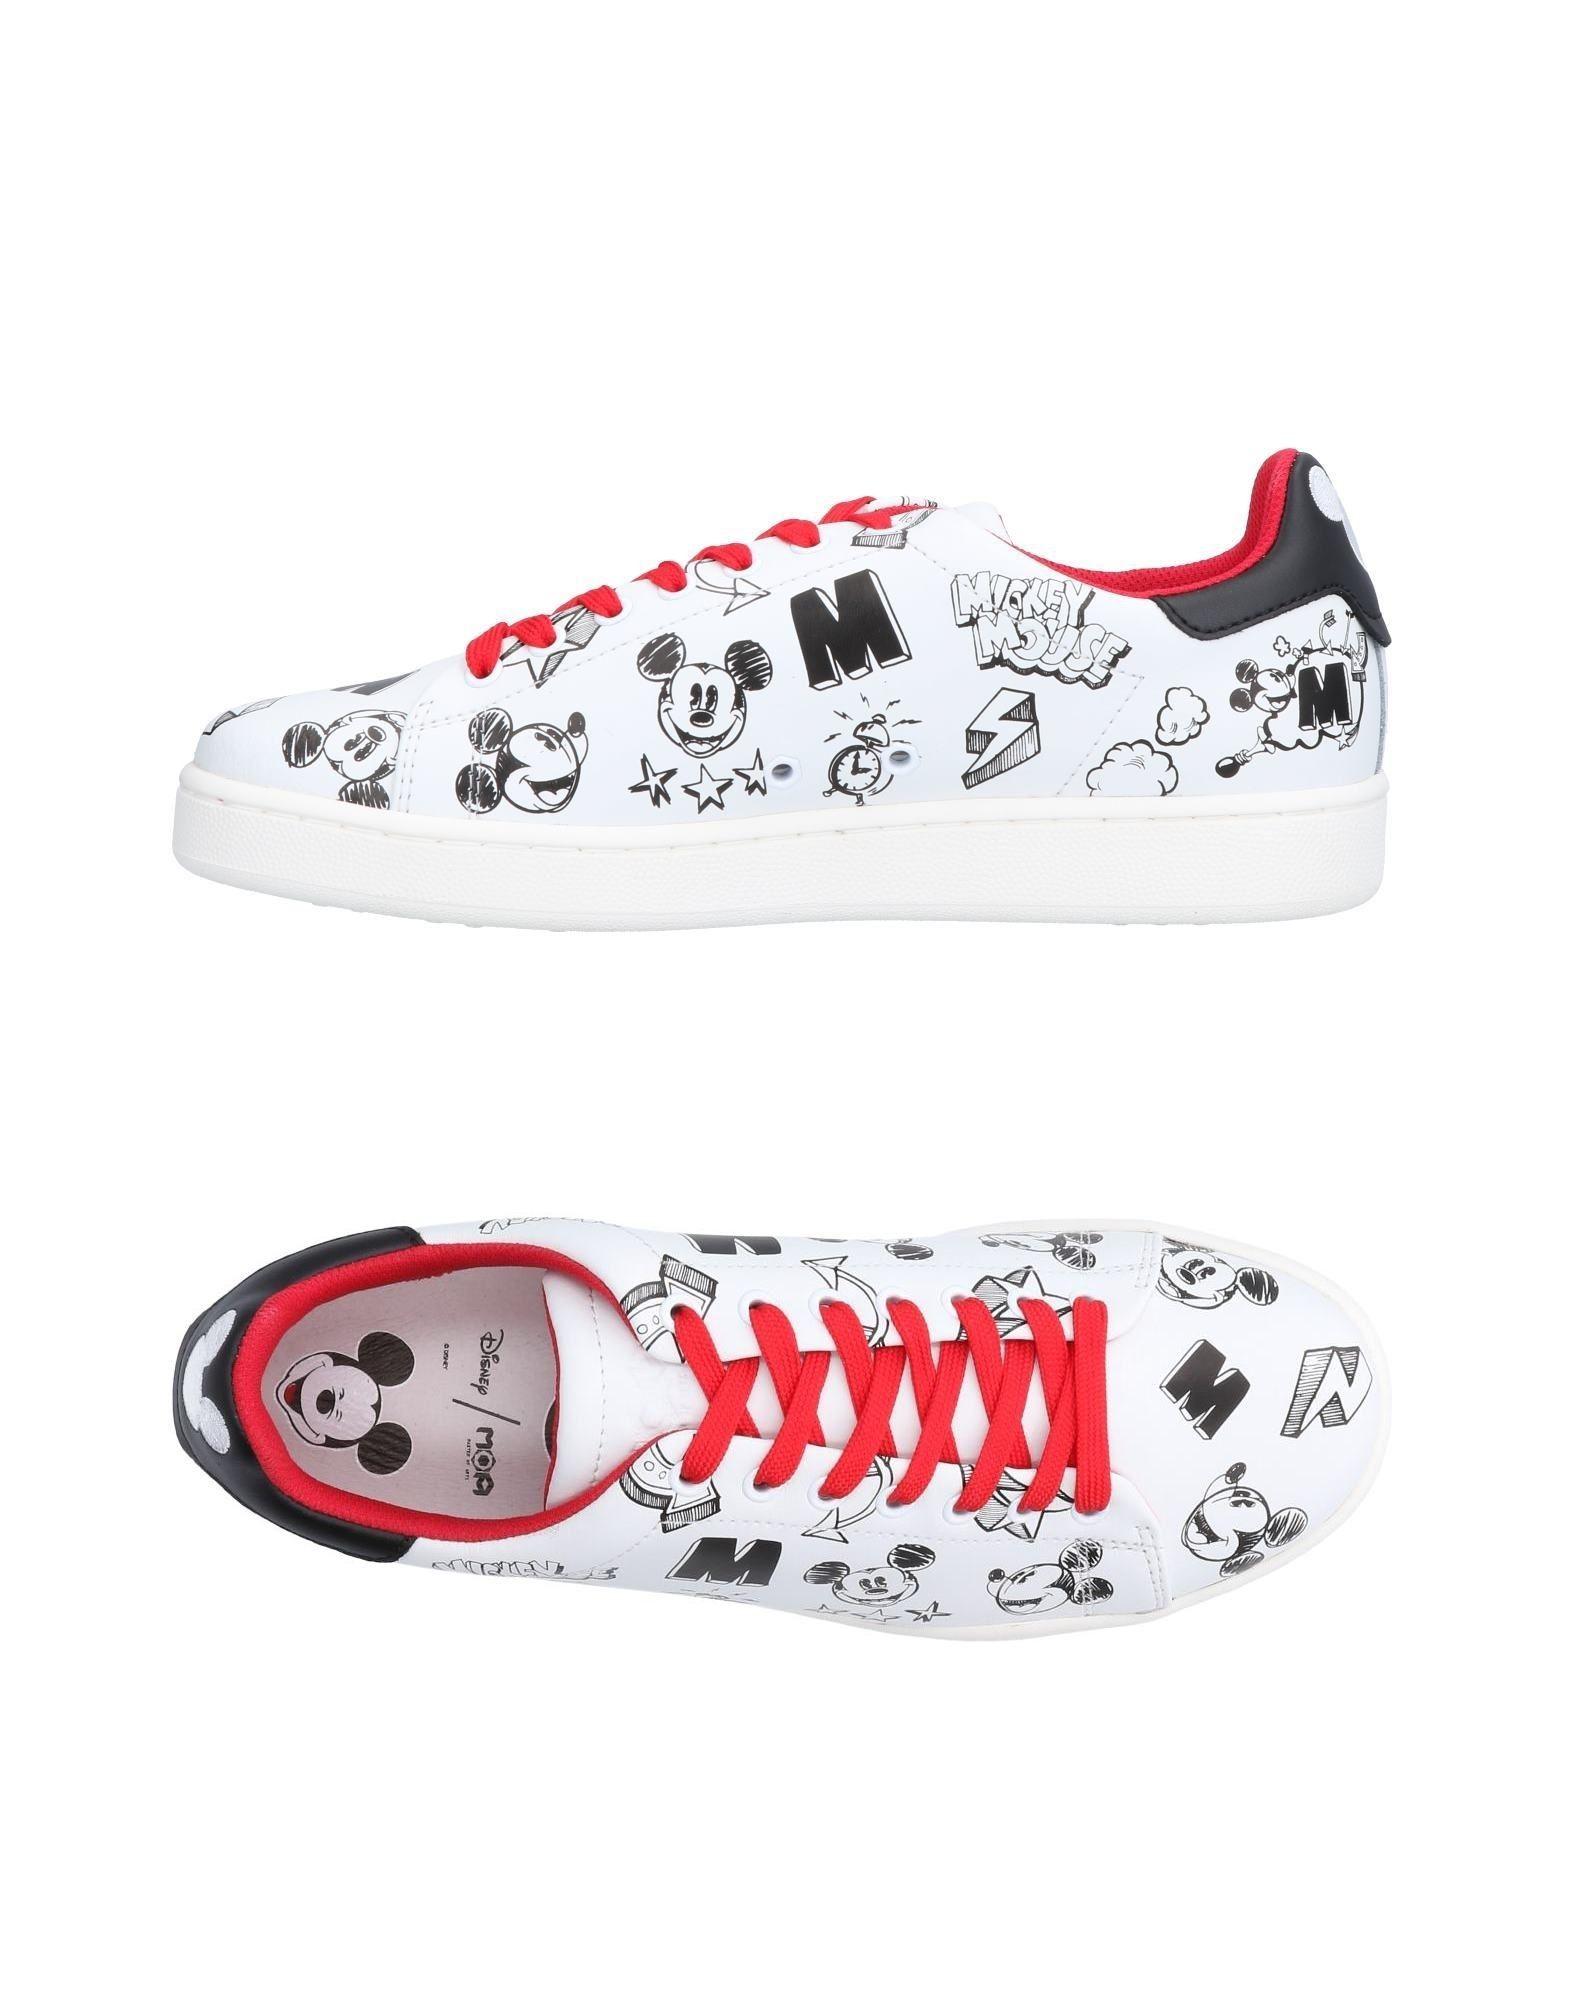 Moa - Master Of Arts Sneakers - Moa Men Moa Master Of Arts Sneakers online on  Australia - 11509821BM 2ca801